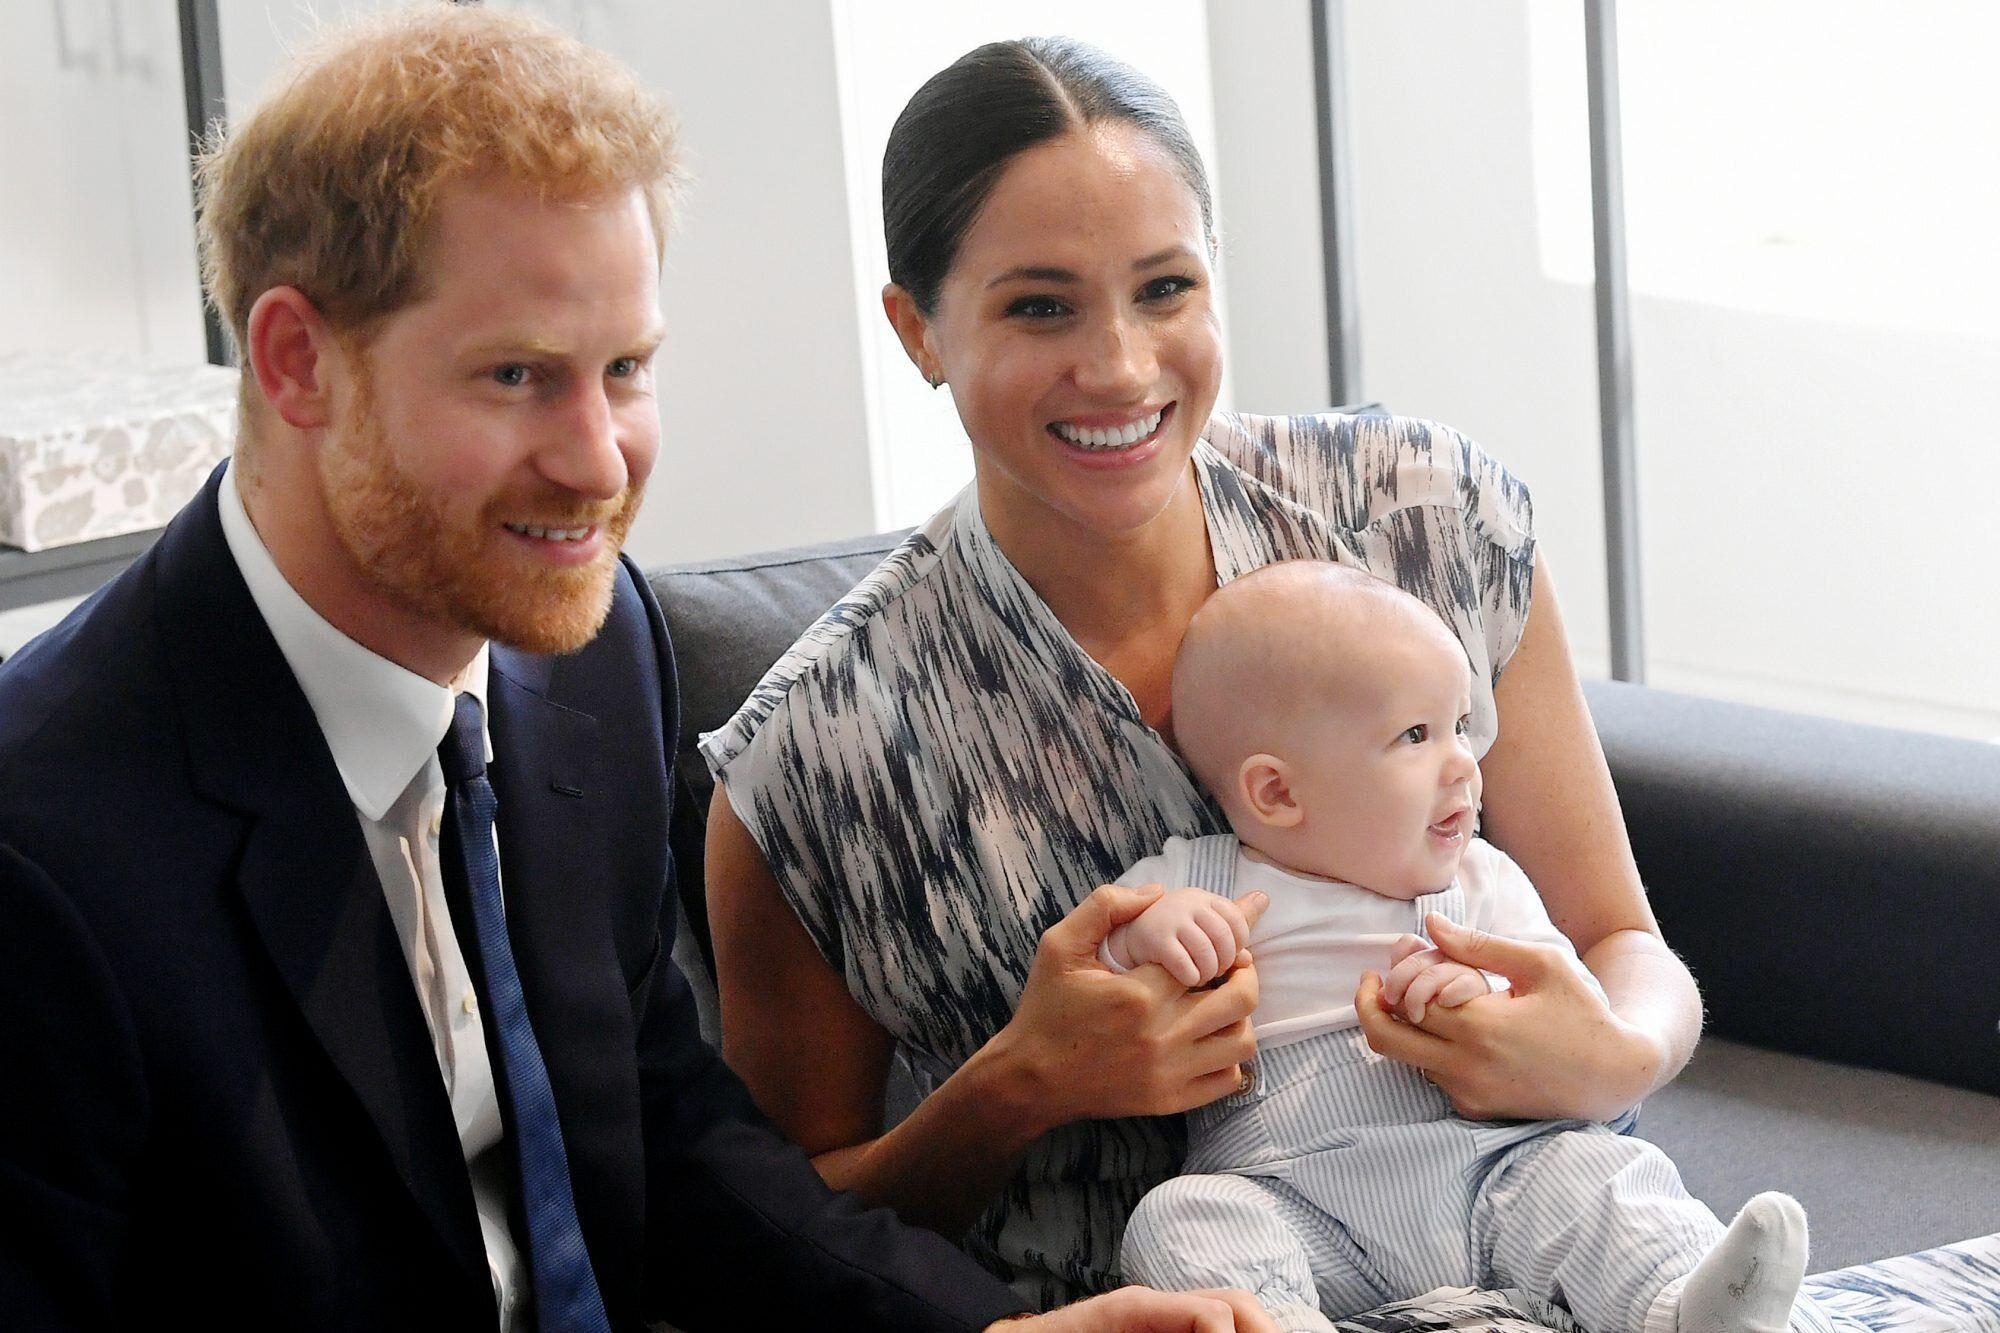 Prince Harry on Fatherhood